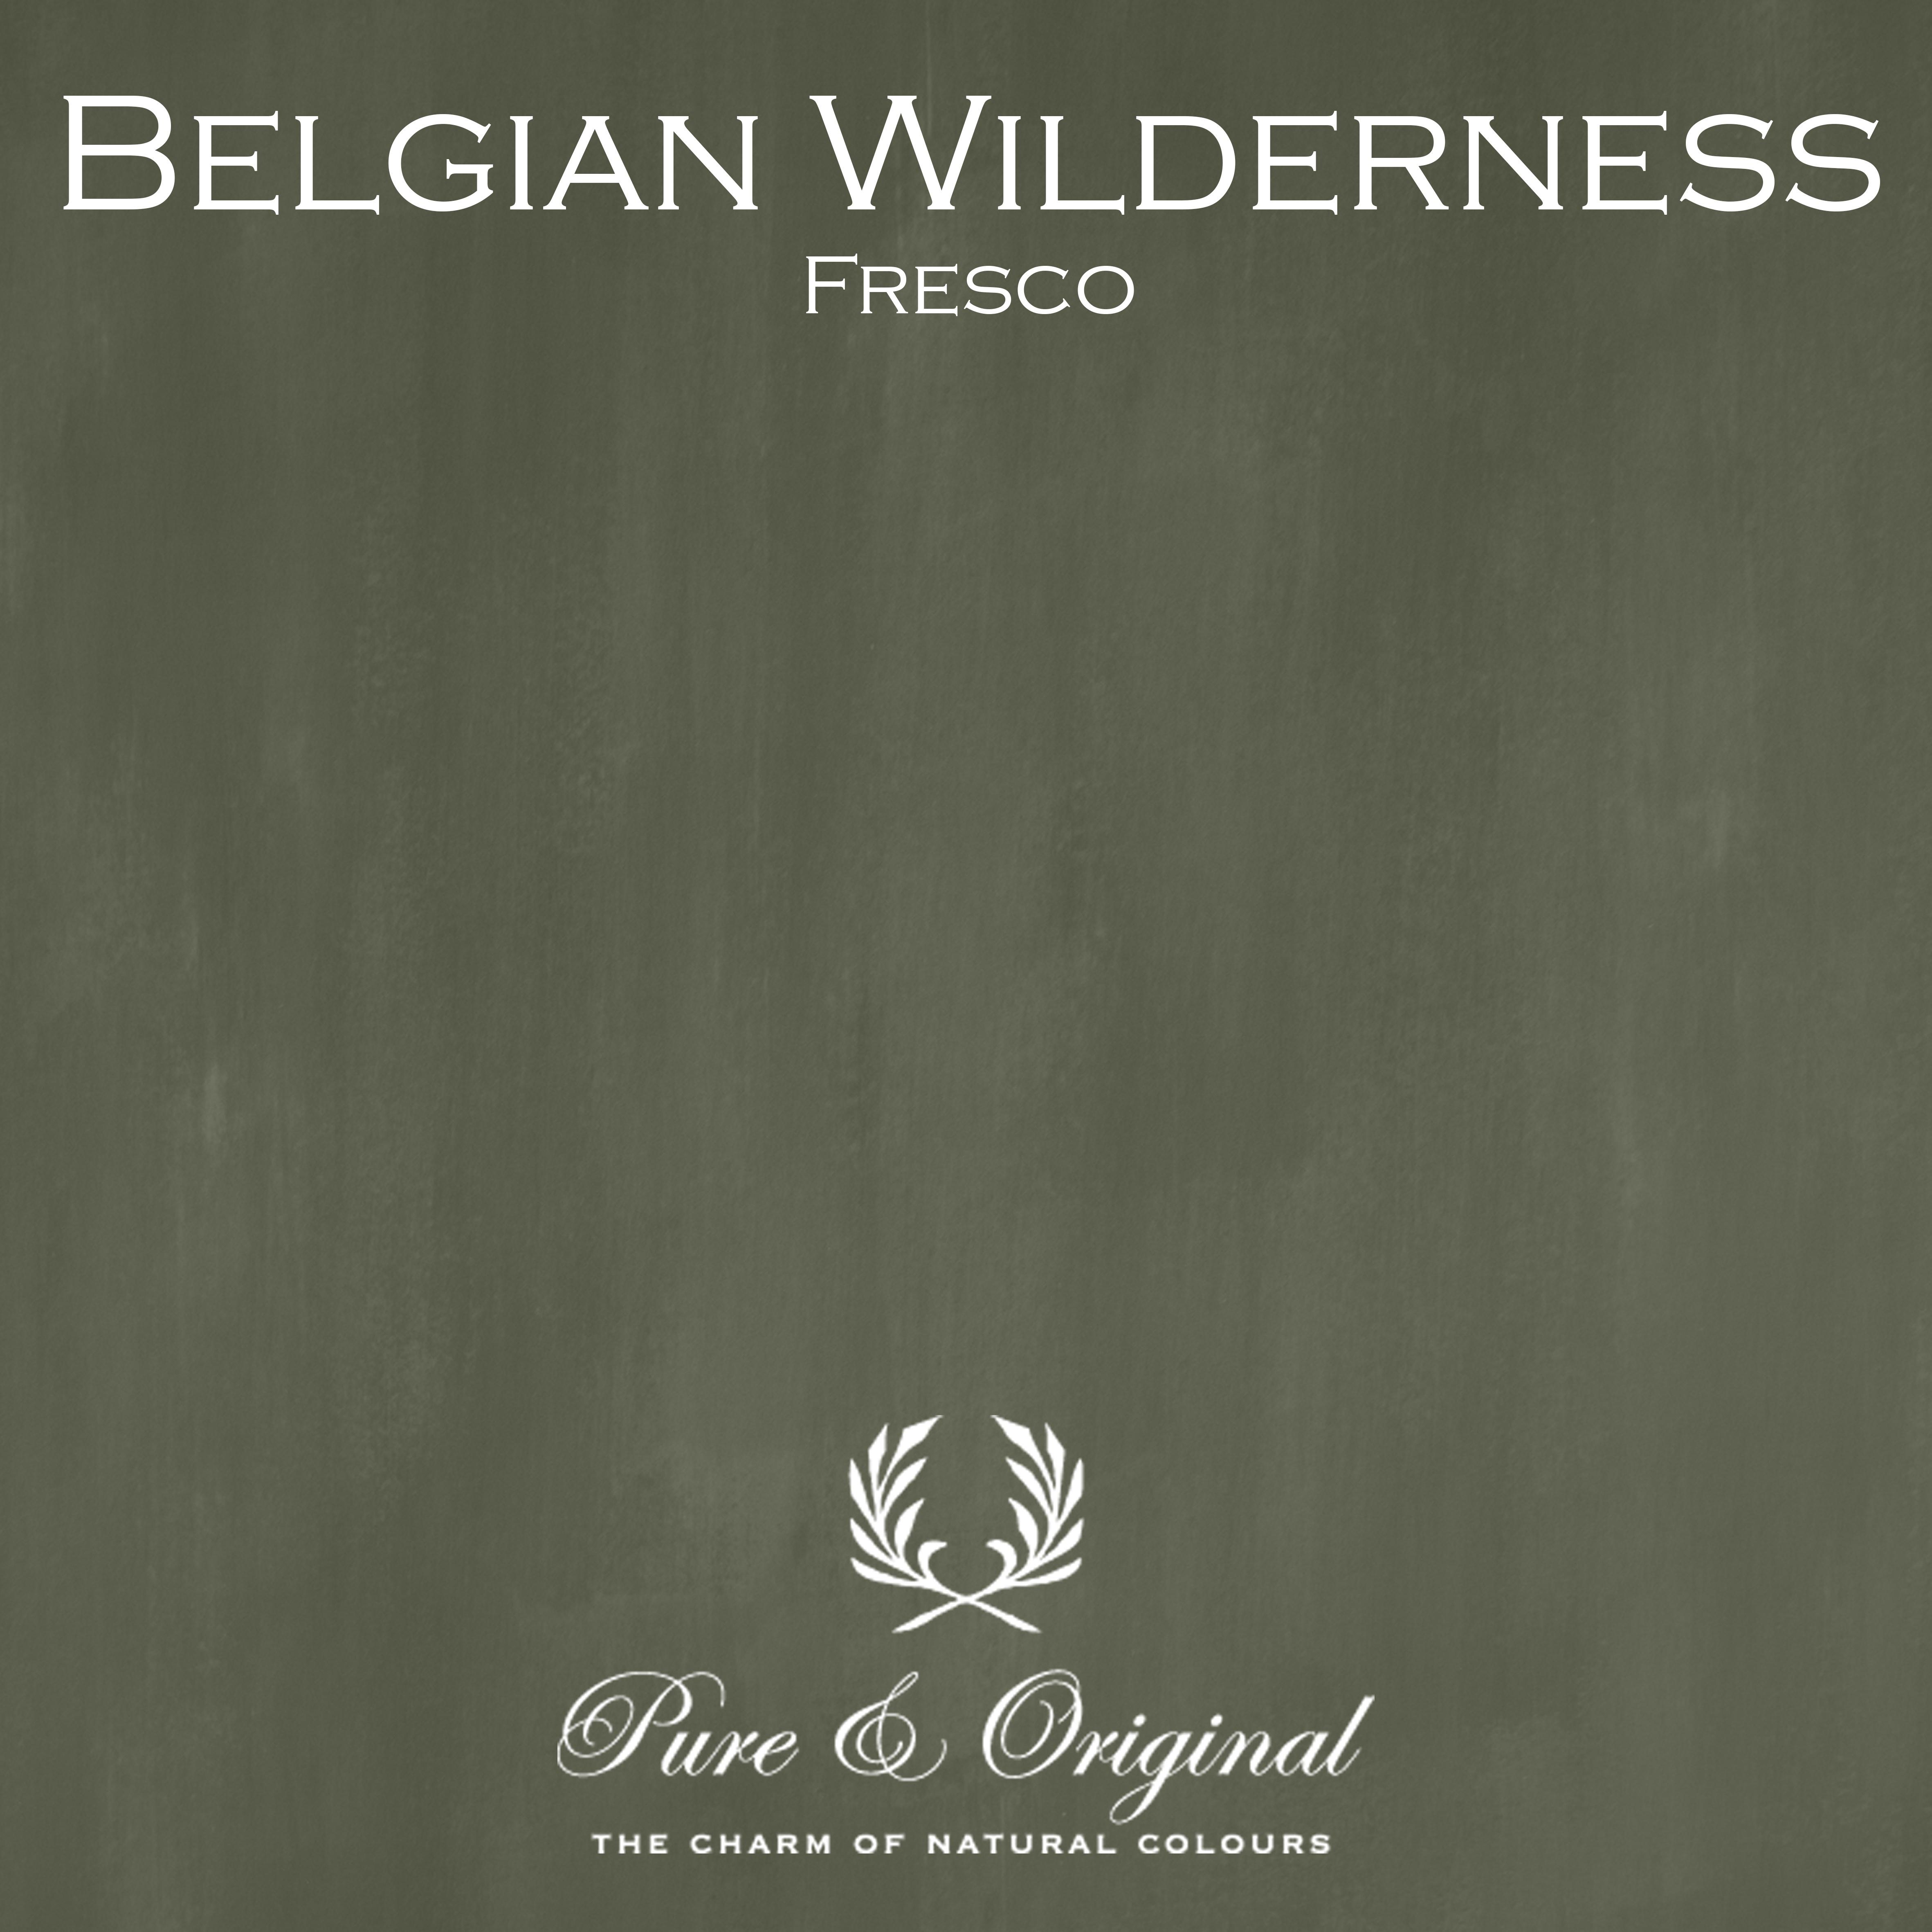 Kulör Belgian Wilderness, Fresco kalkfärg